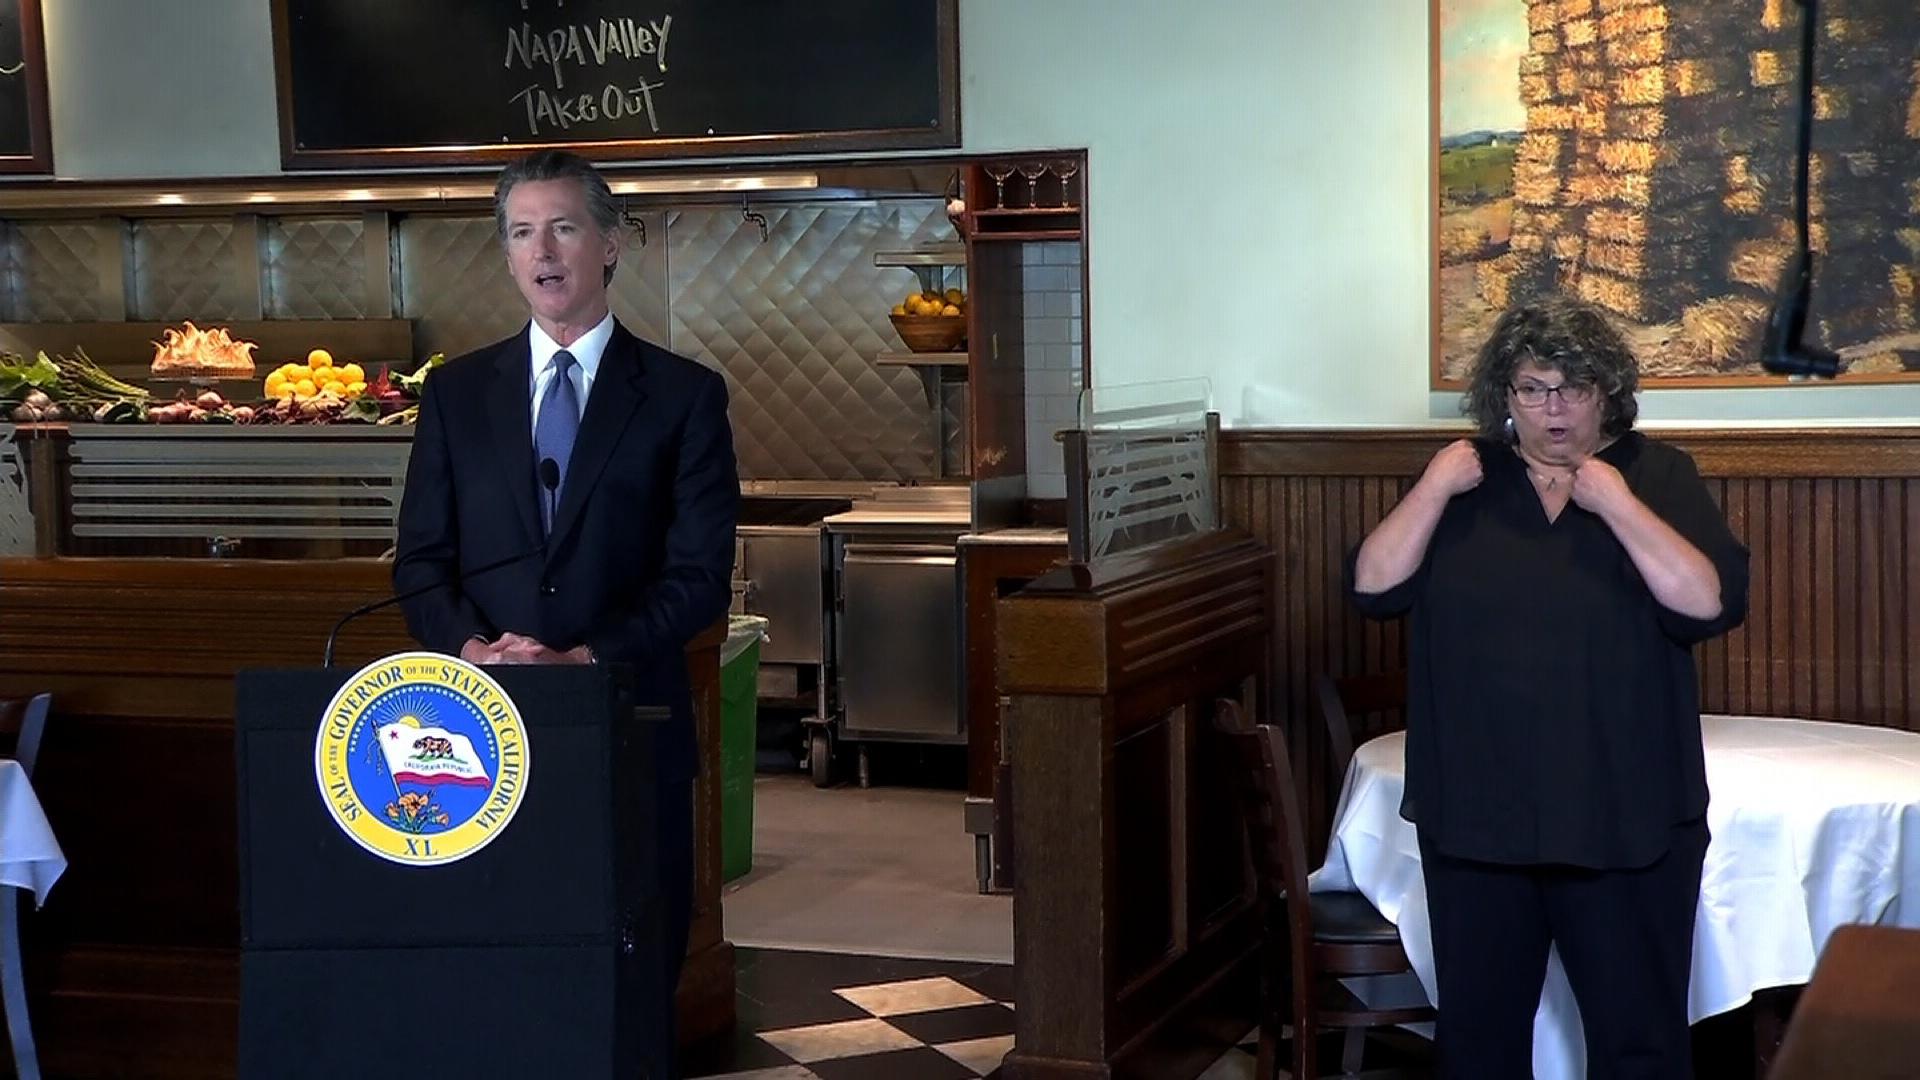 California Gov. Gavin Newsom speaks during a press conference in Sacramento, California, on May 18.